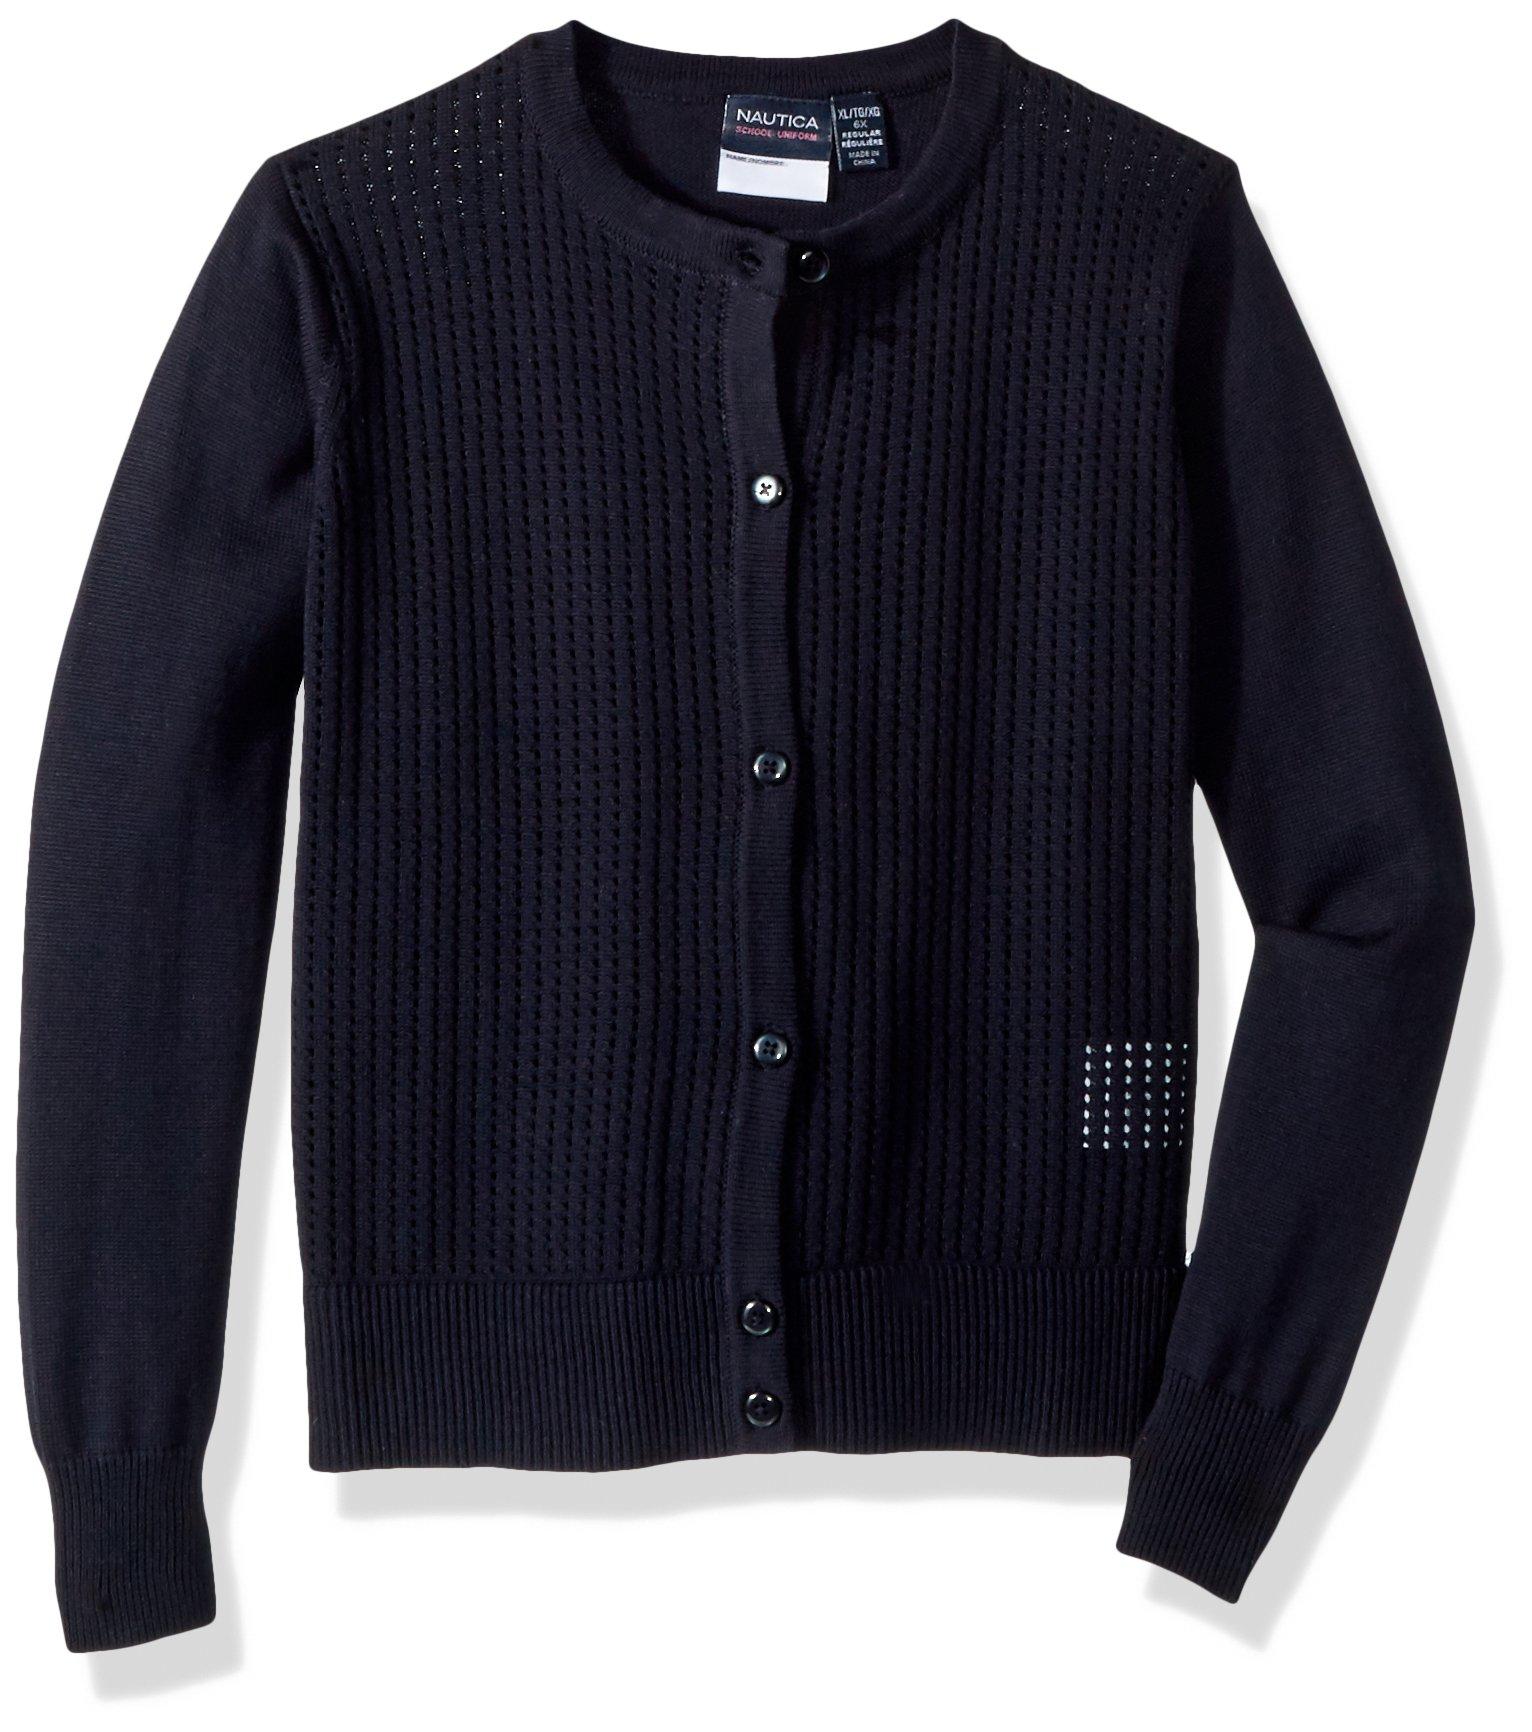 Nautica Big Girls' Cardigan Sweater, Navy/Pointelle Cardigan, M (8/10)